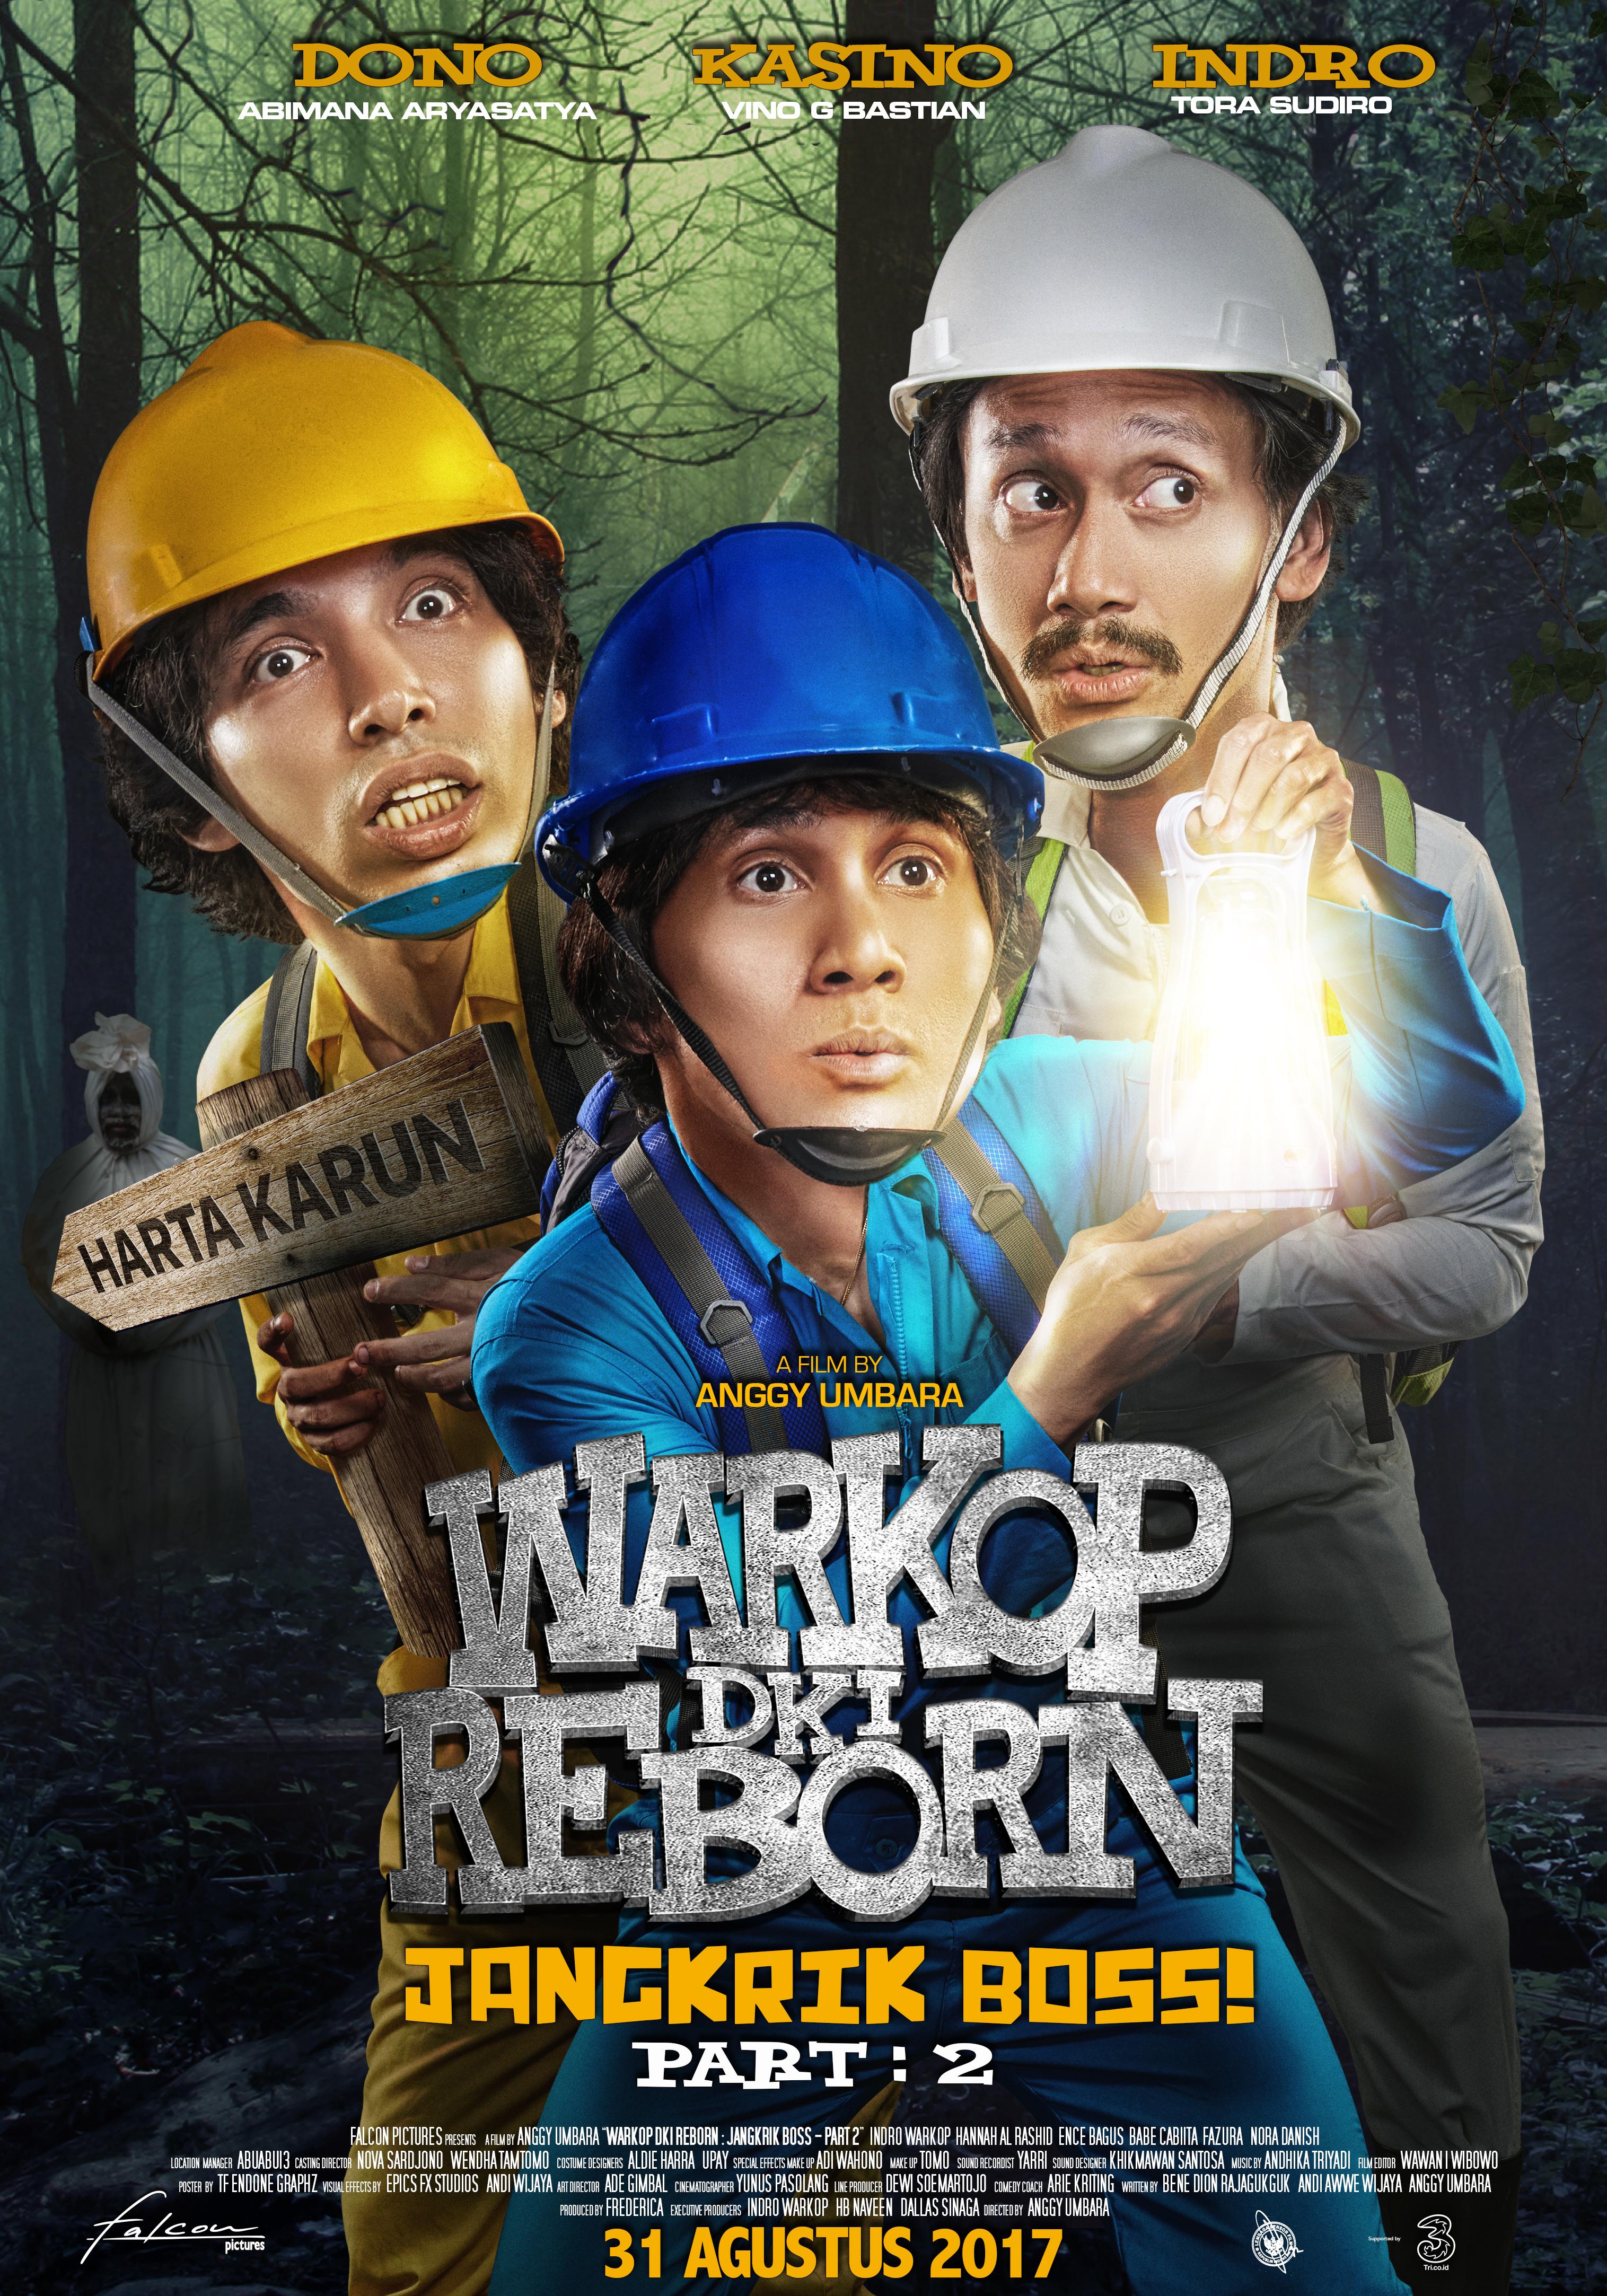 warkop dki reborn jangkrik boss part 2 2017 imdb rh imdb com download film warkop dki reborn jangkrik boss part 2 bluray download film warkop dki reborn jangkrik boss part 2 (2017)